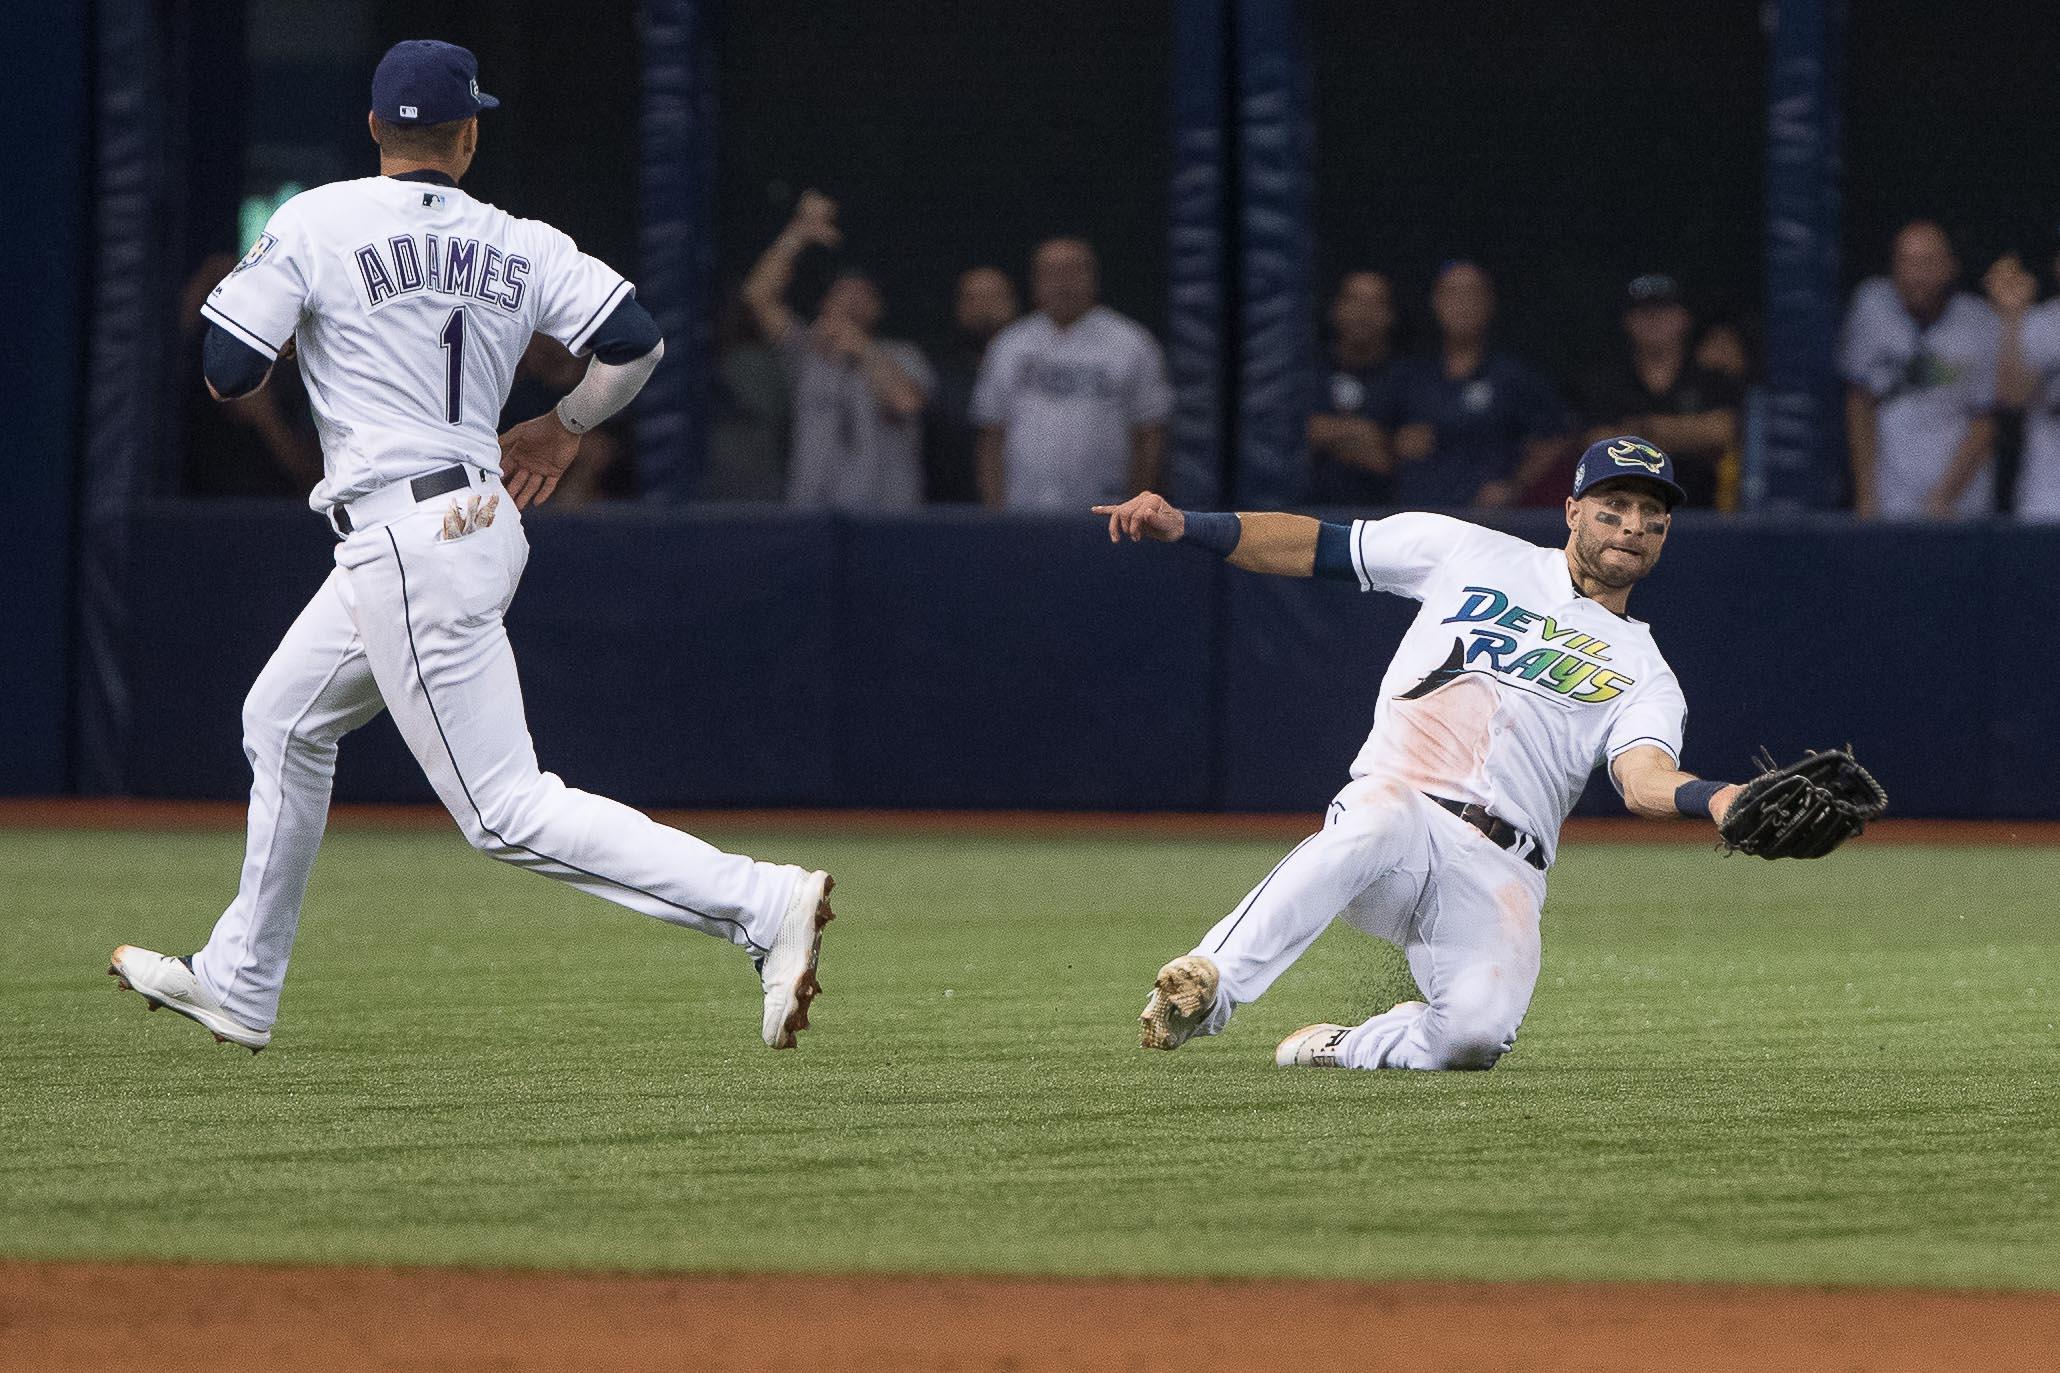 Kiermaier makes a sliding catch for the Rays.//STEVEN MUNCIE